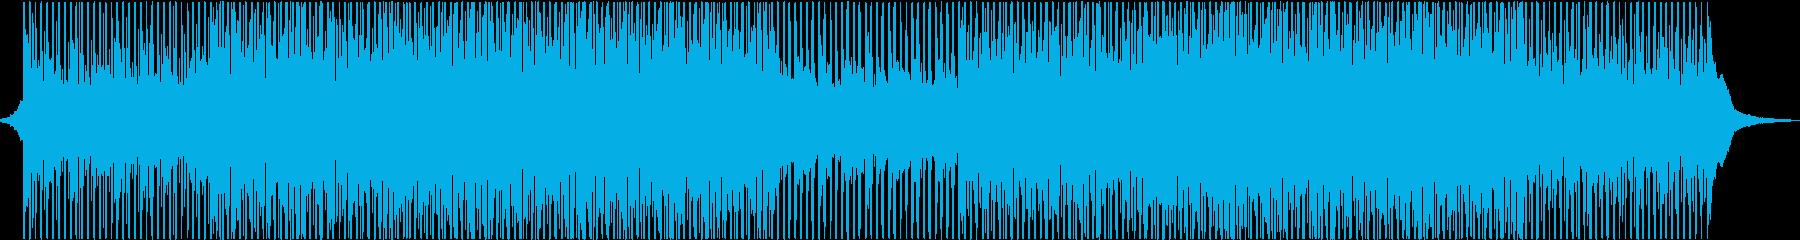 background musicの再生済みの波形